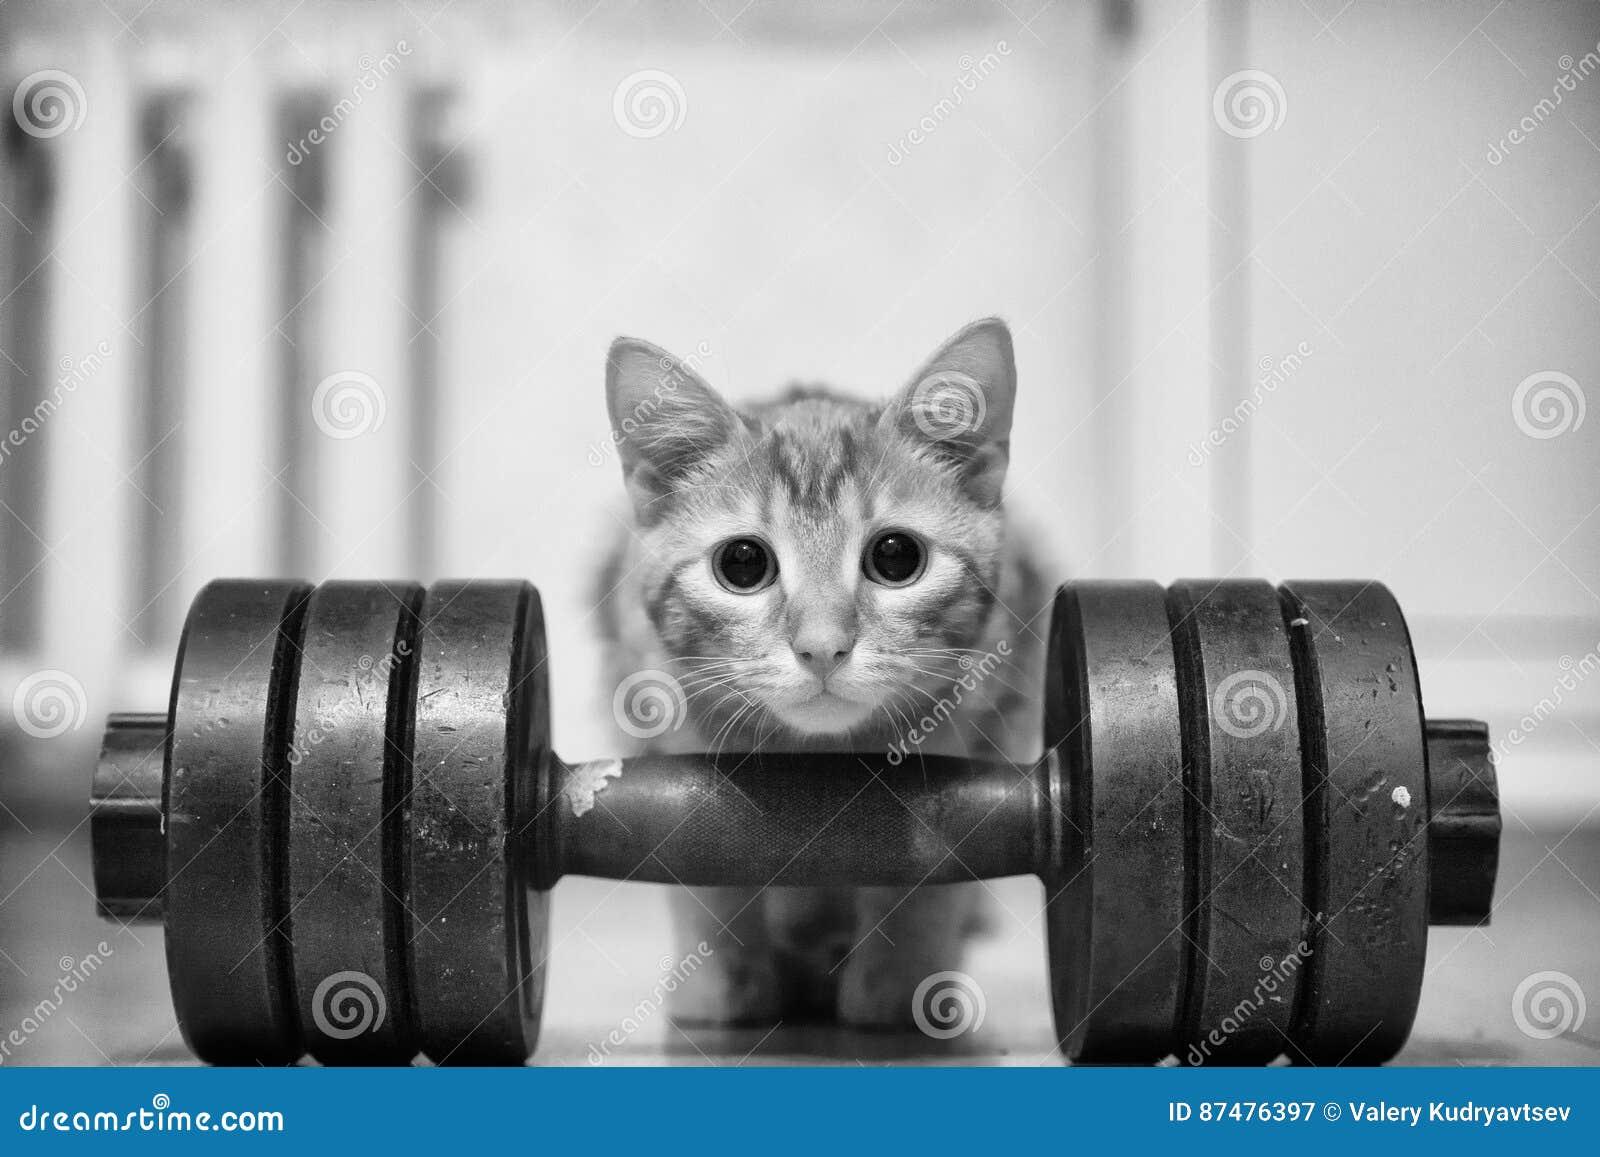 Культурист Powerlifter спортсмена кота